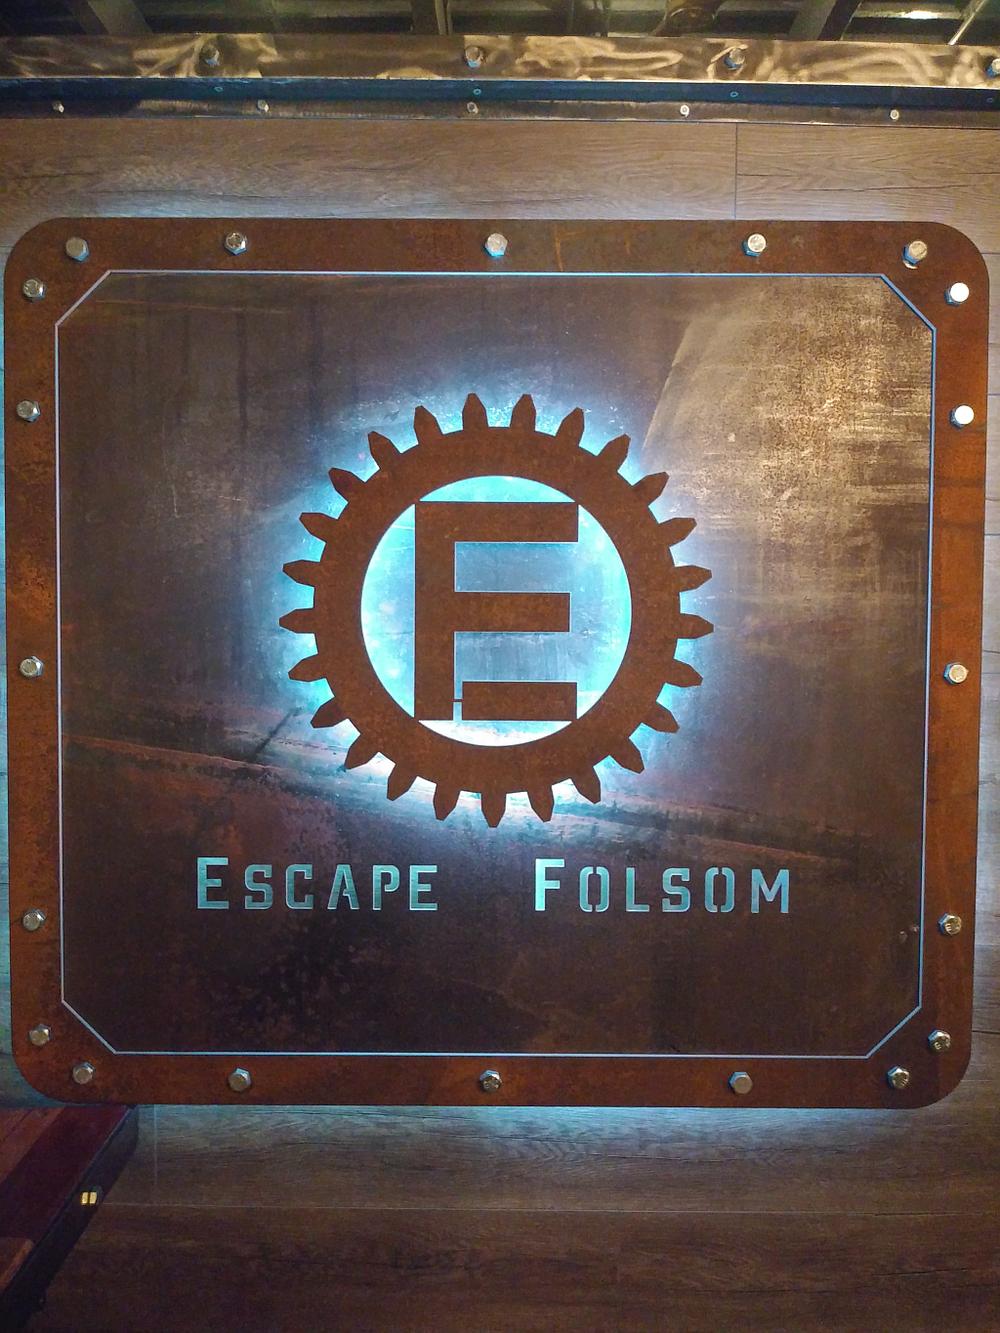 Escape Folsom - 727 Traders Ln, Folsom, CAEscape Folsom Sign